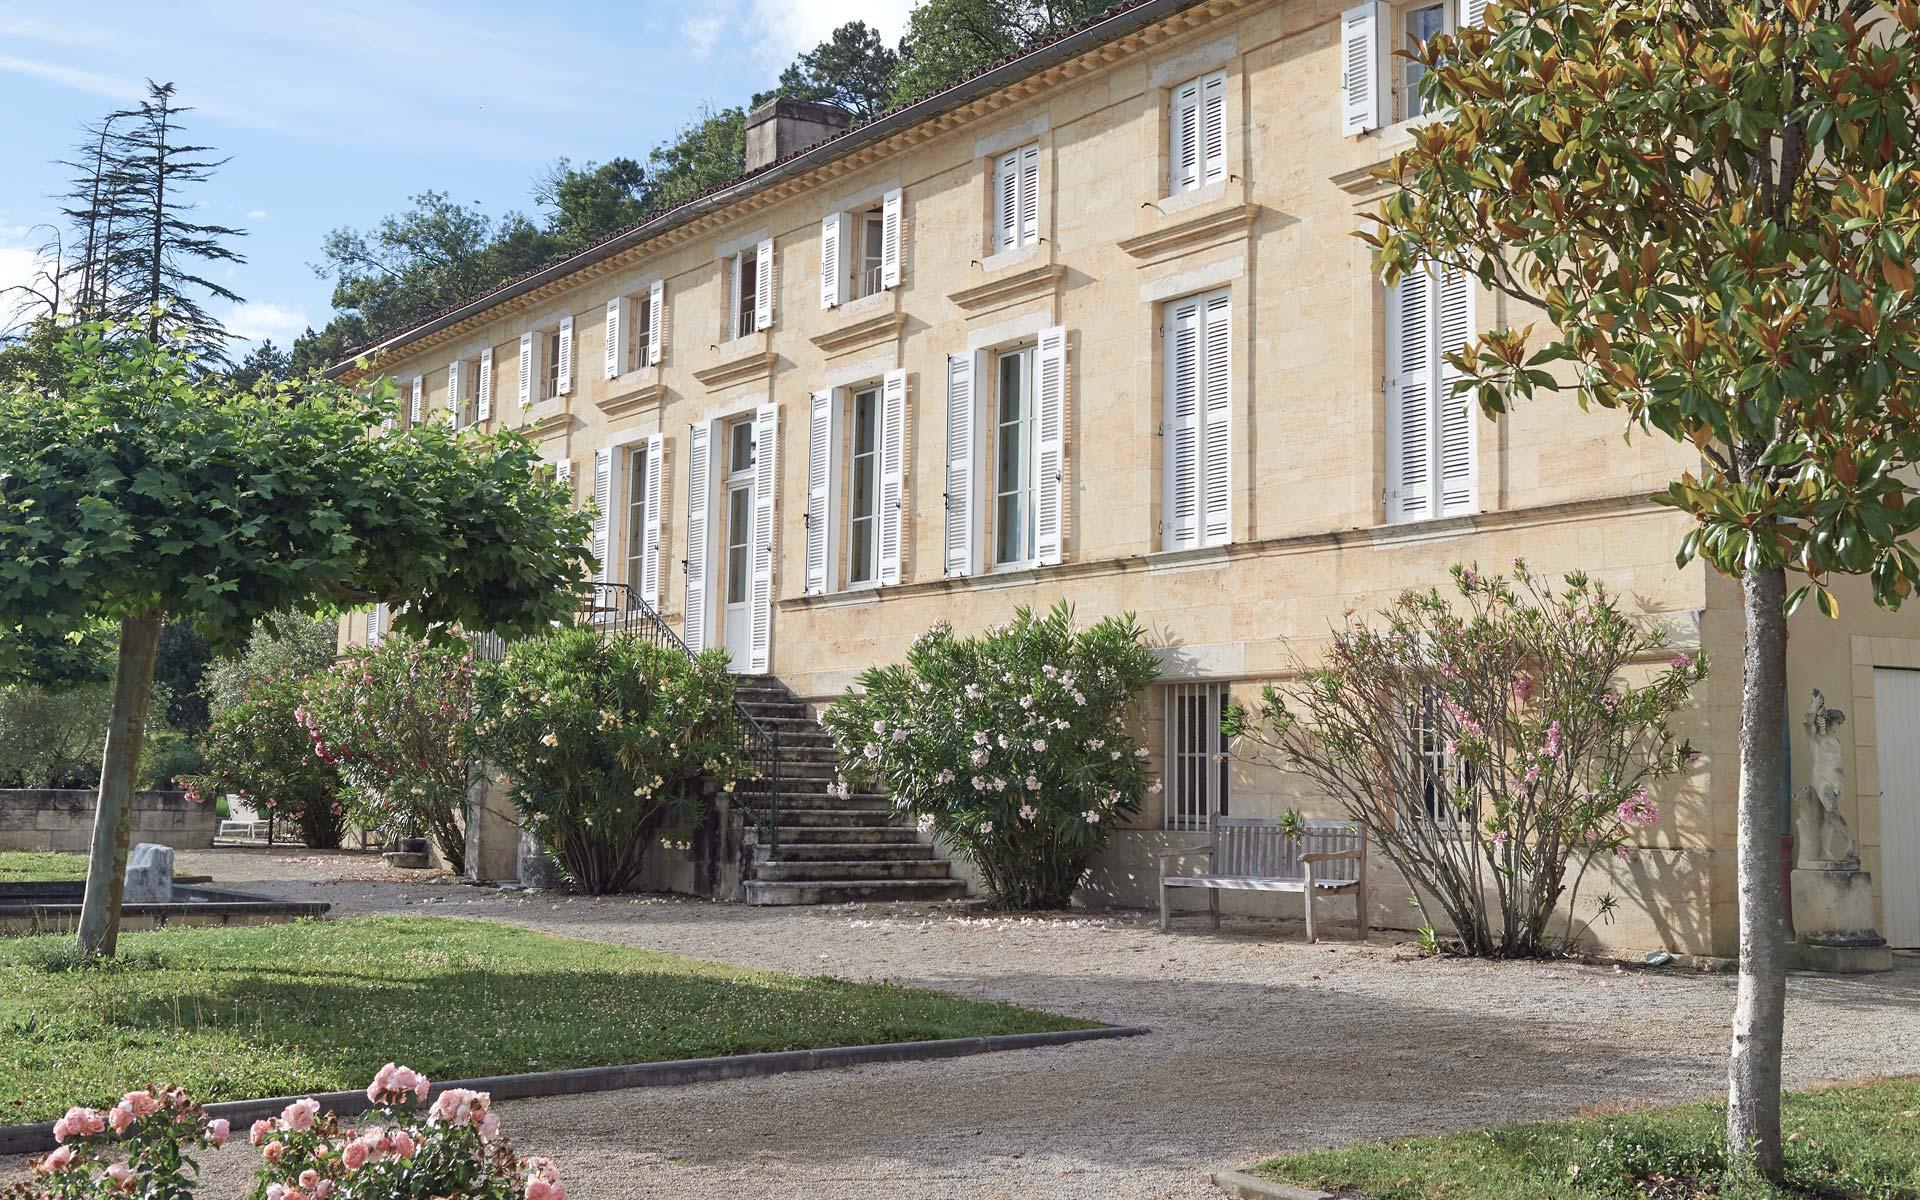 Chateau Champcenetz